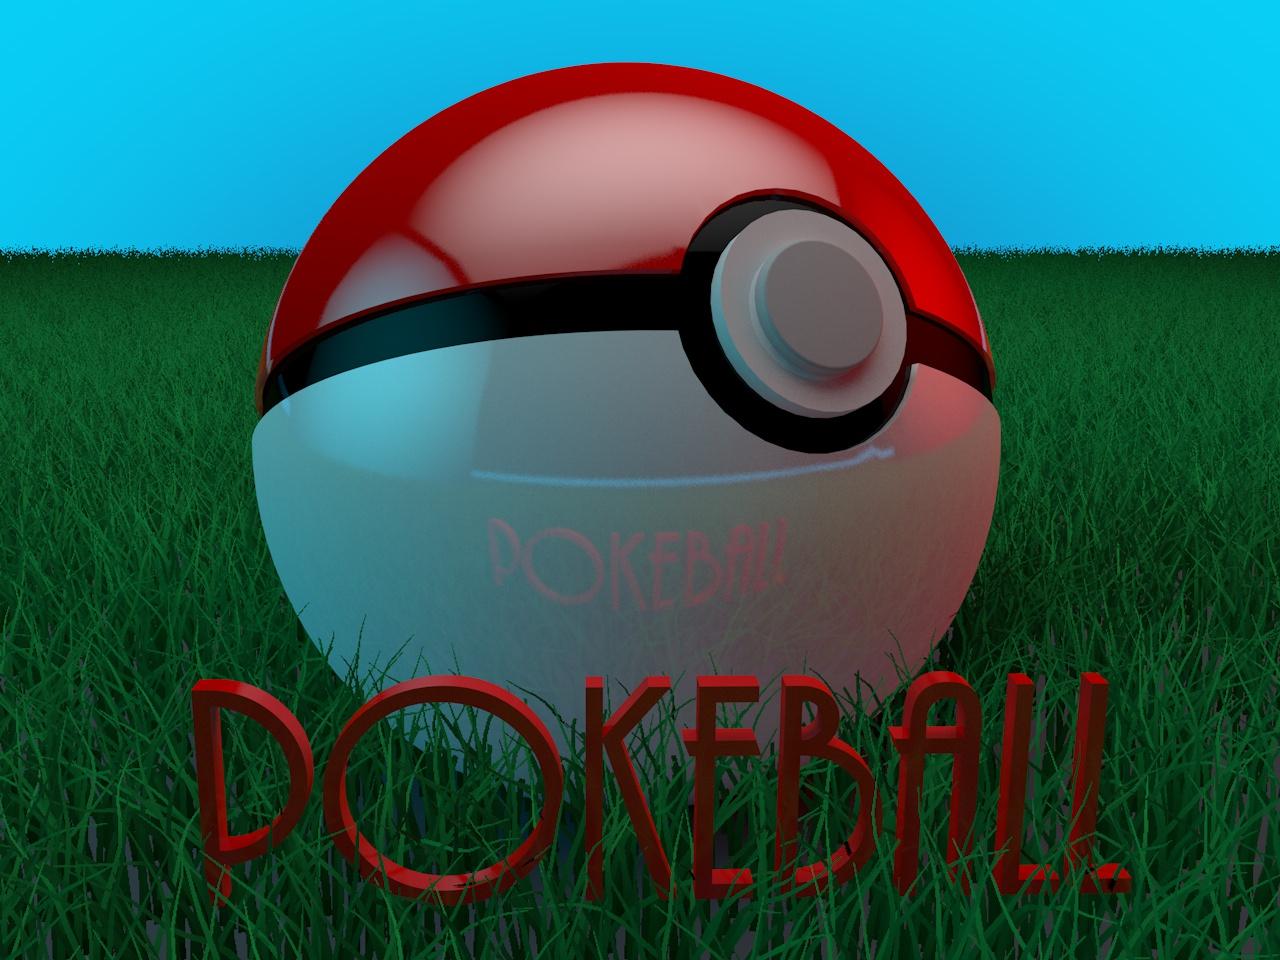 PokeBall on Grass